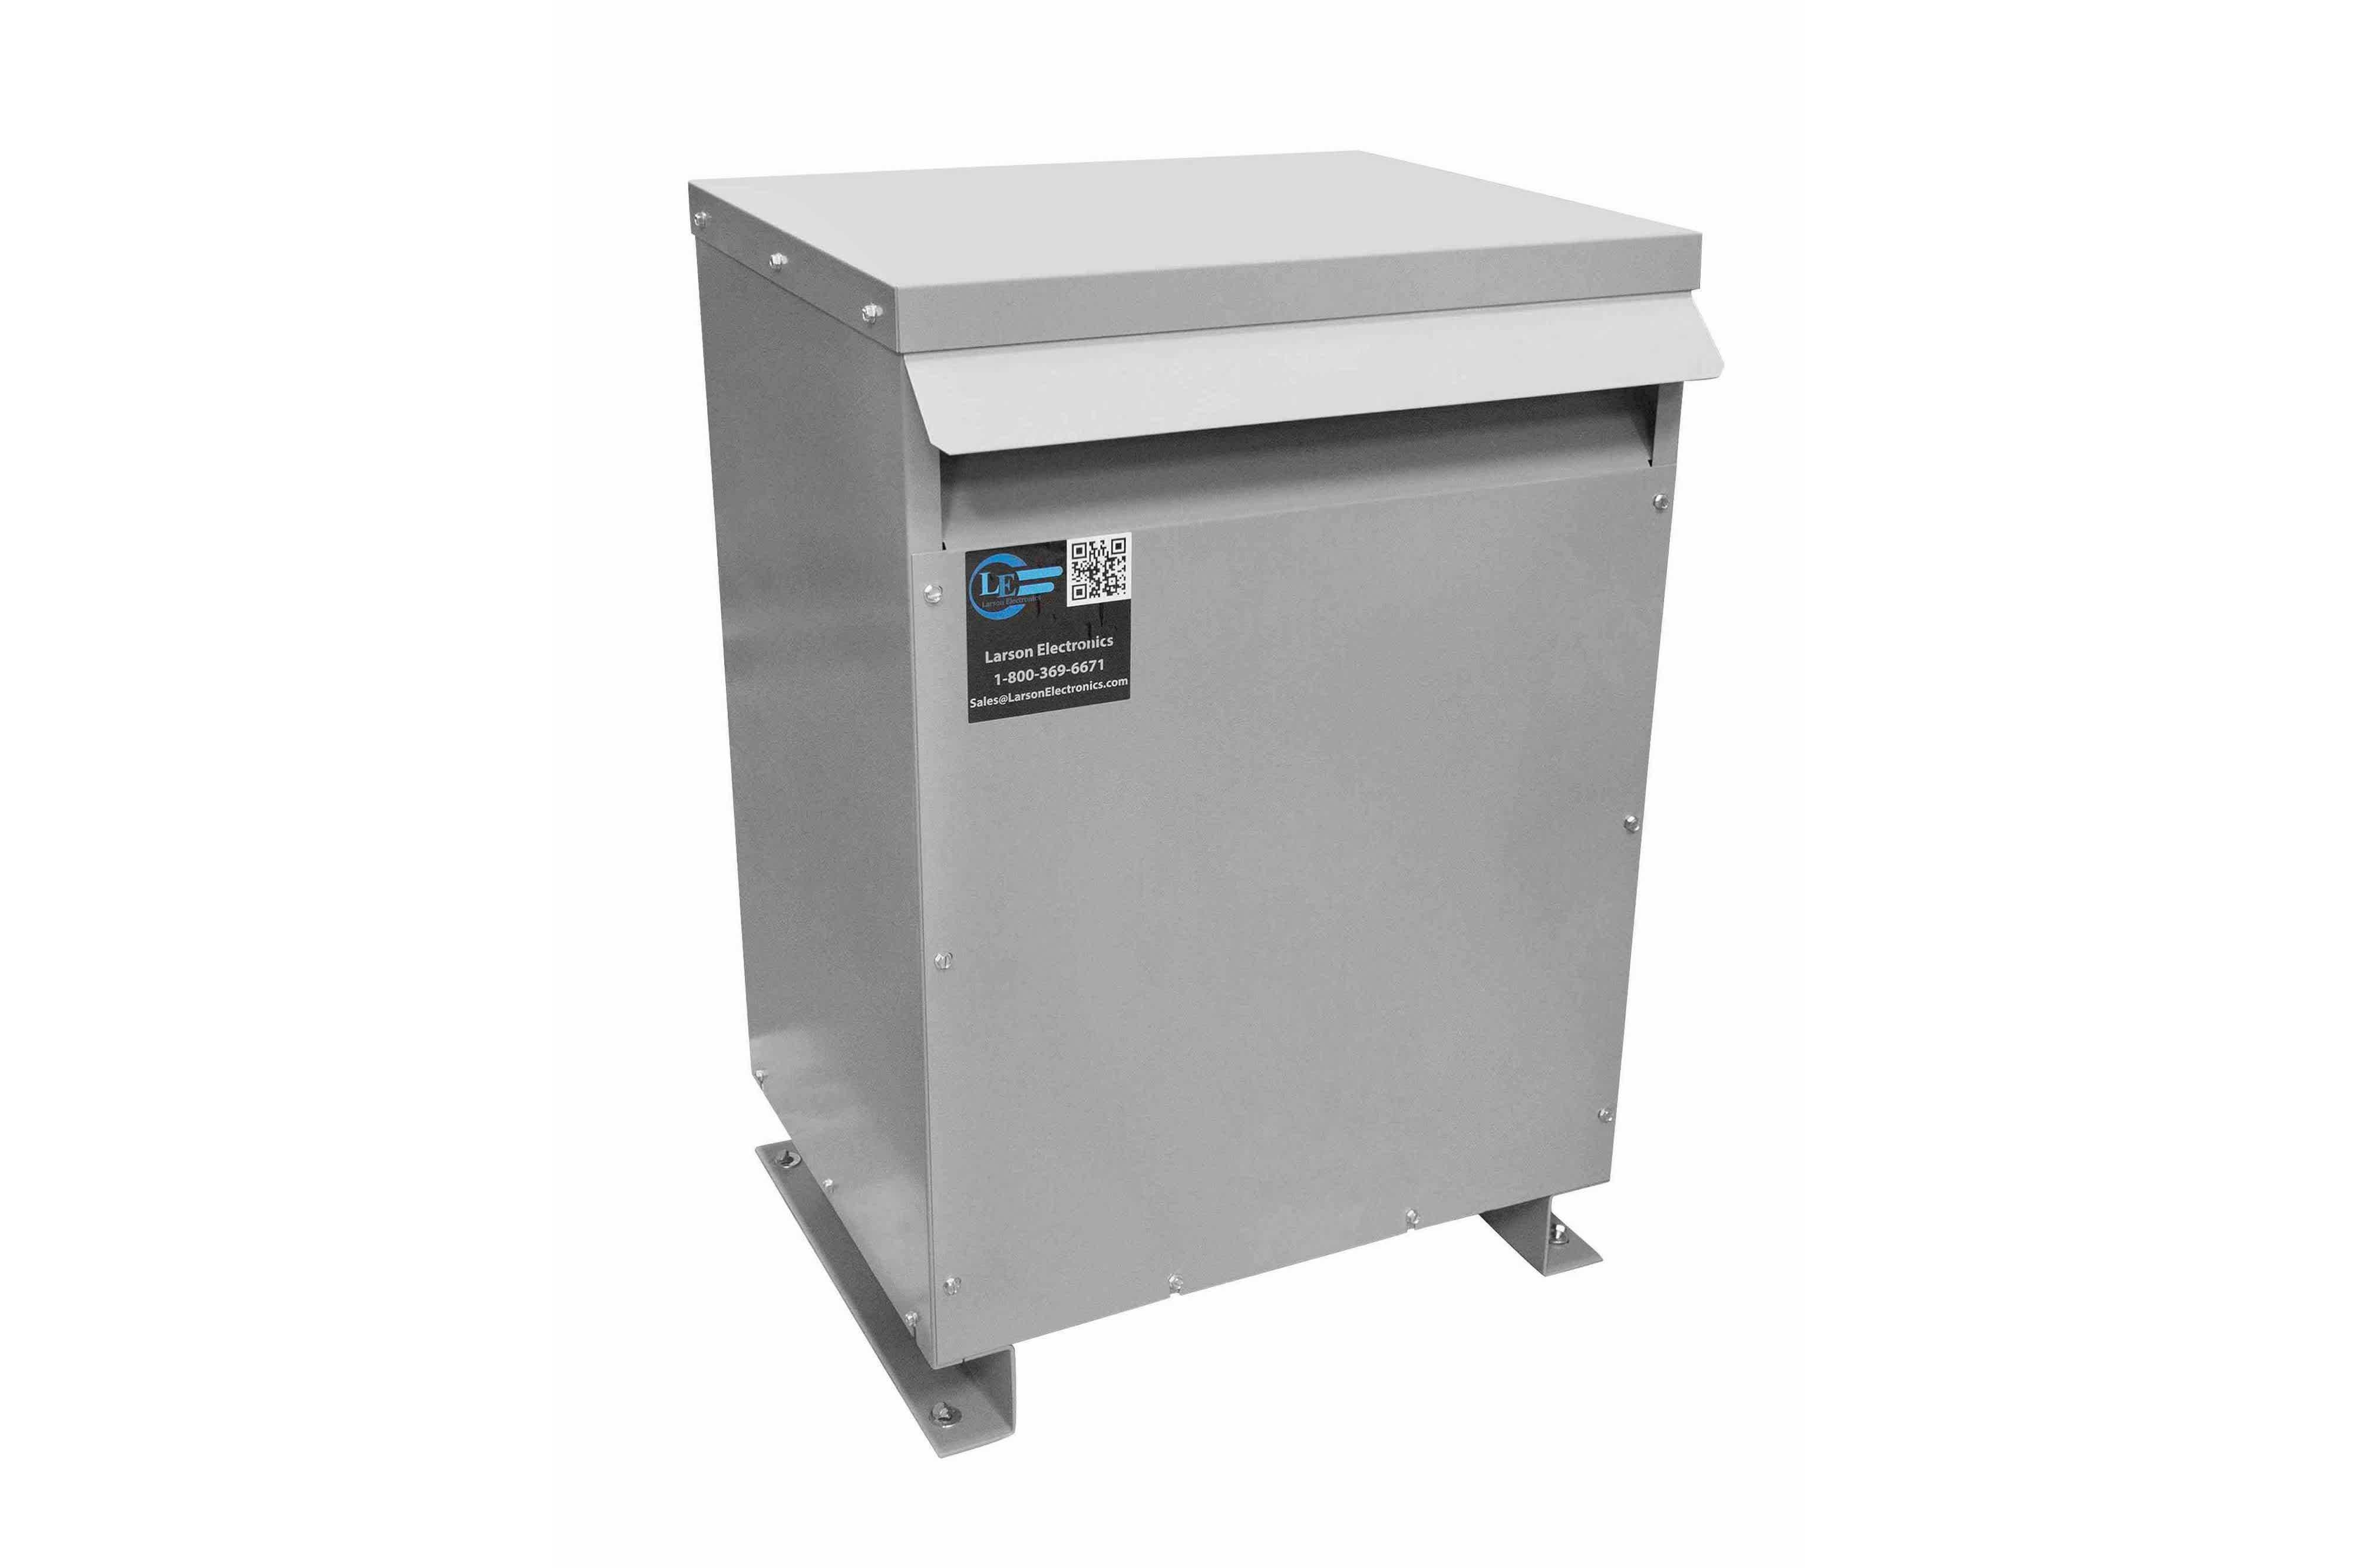 237.5 kVA 3PH Isolation Transformer, 480V Wye Primary, 600V Delta Secondary, N3R, Ventilated, 60 Hz